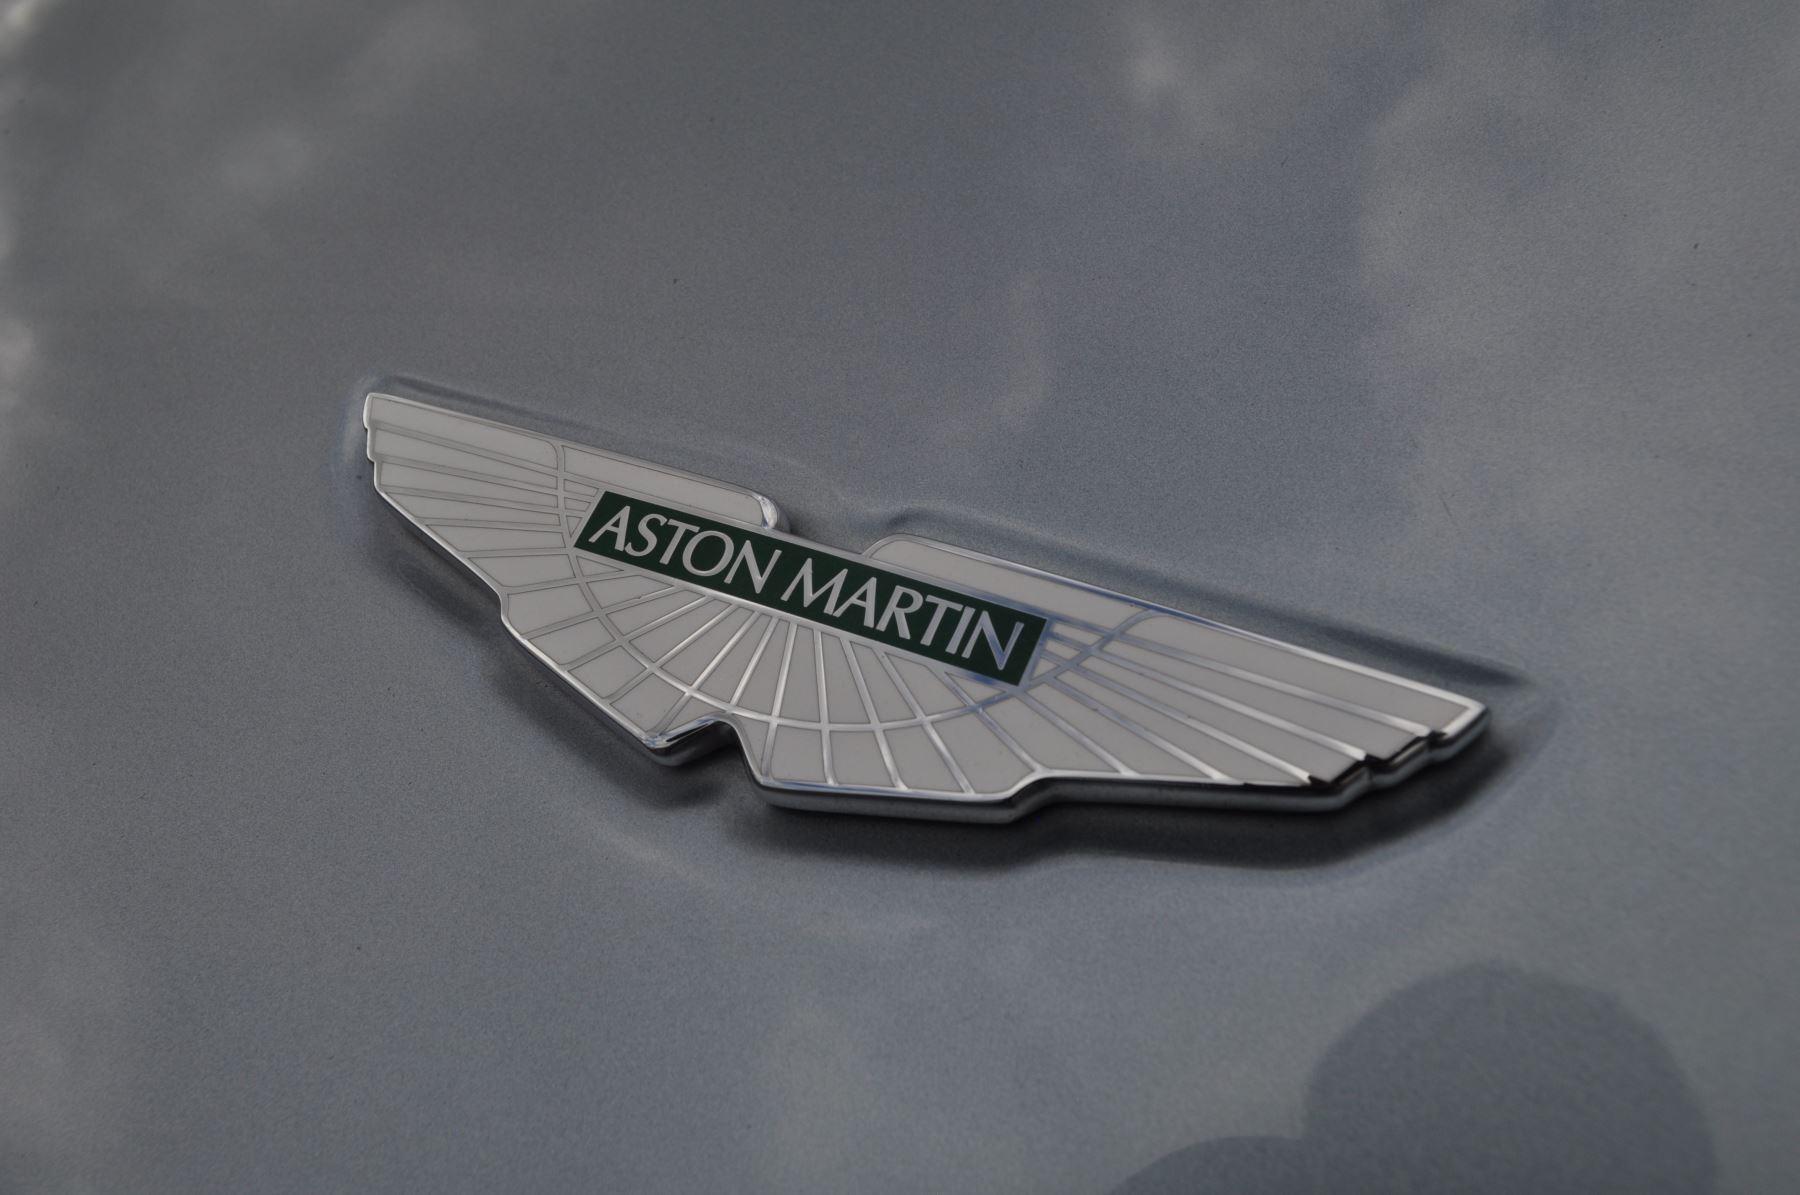 Aston Martin V8 Vantage S Coupe Coupe image 20